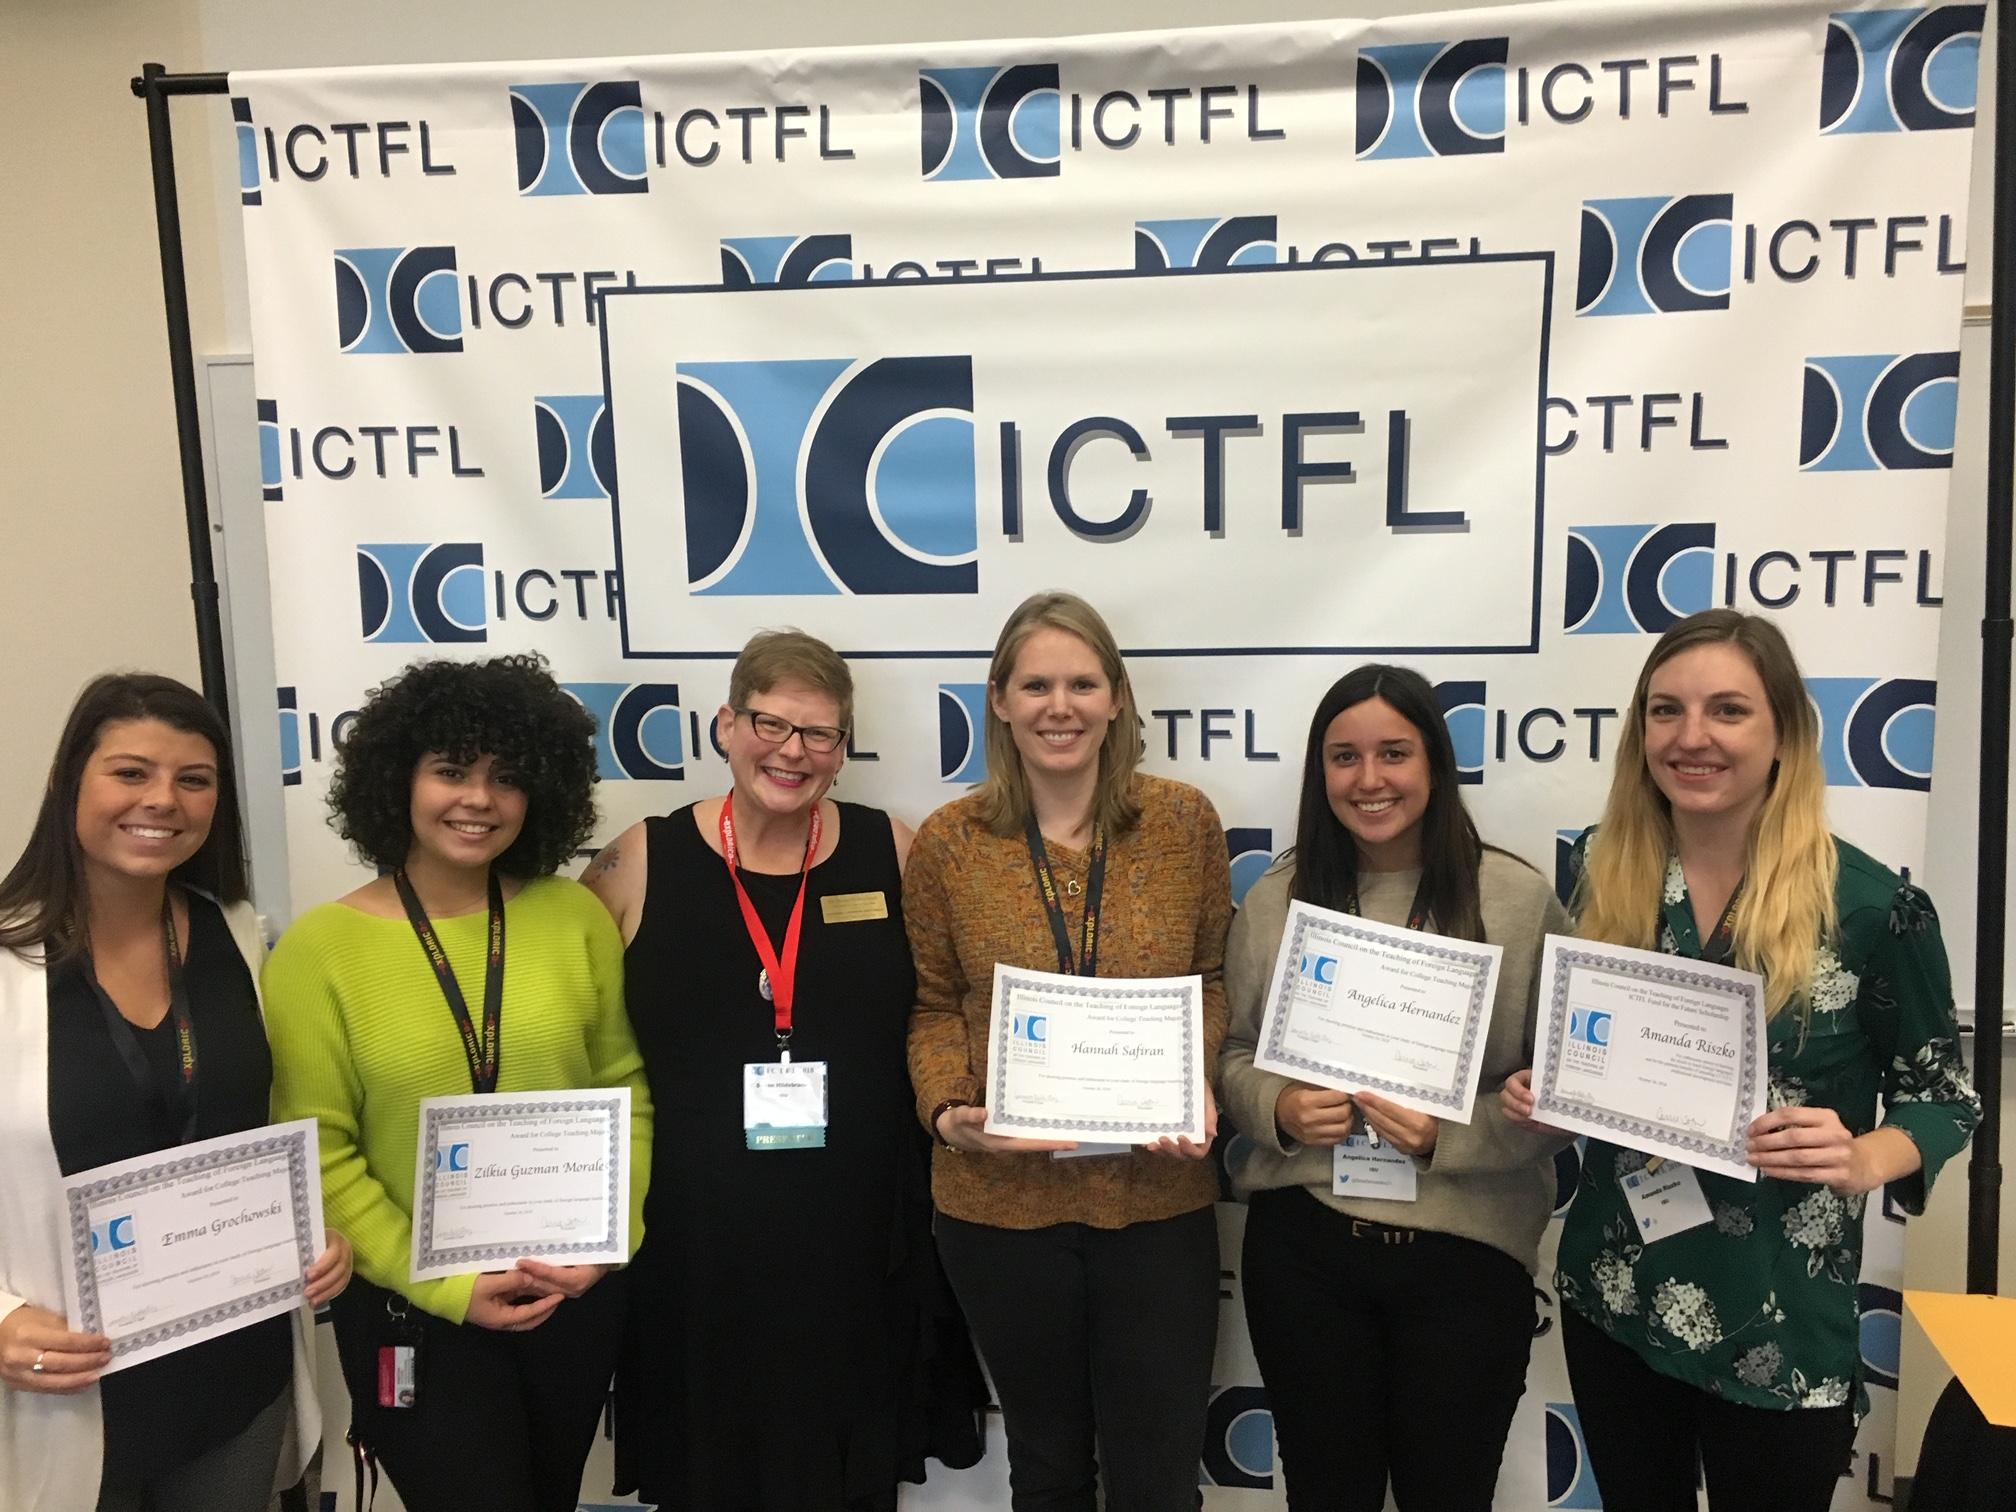 Emma Grochowski (left), Zilkia Guzmán Morales,Hannah Safiran, Angelica Hernandez, and Amanda Riszko, were all recipients of the award. Professor Susan Hildebrandt is third from left.